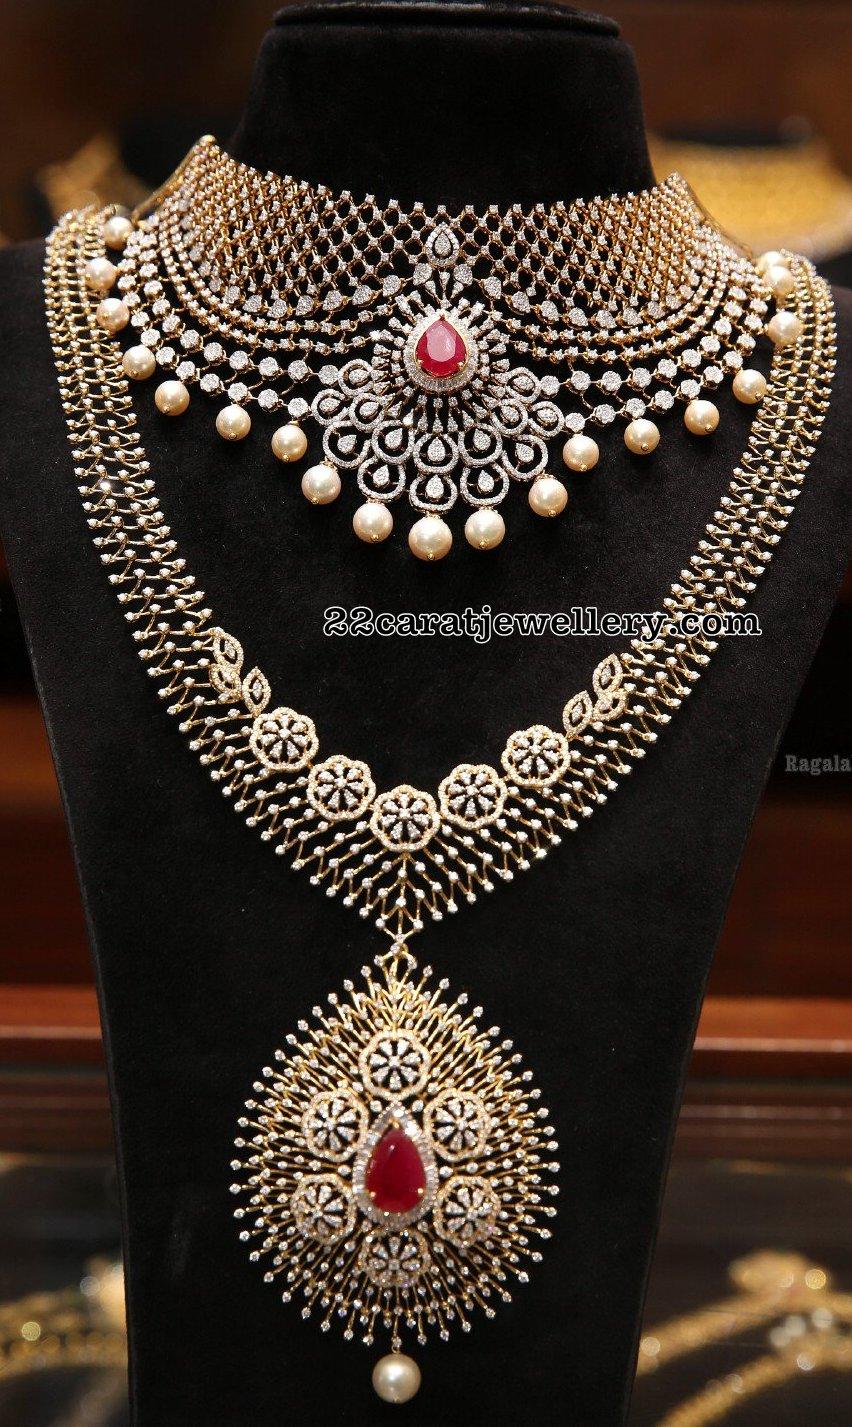 c0e42142e7df3 Malabar Gold Diamond Artistry Jewelry - Jewellery Designs